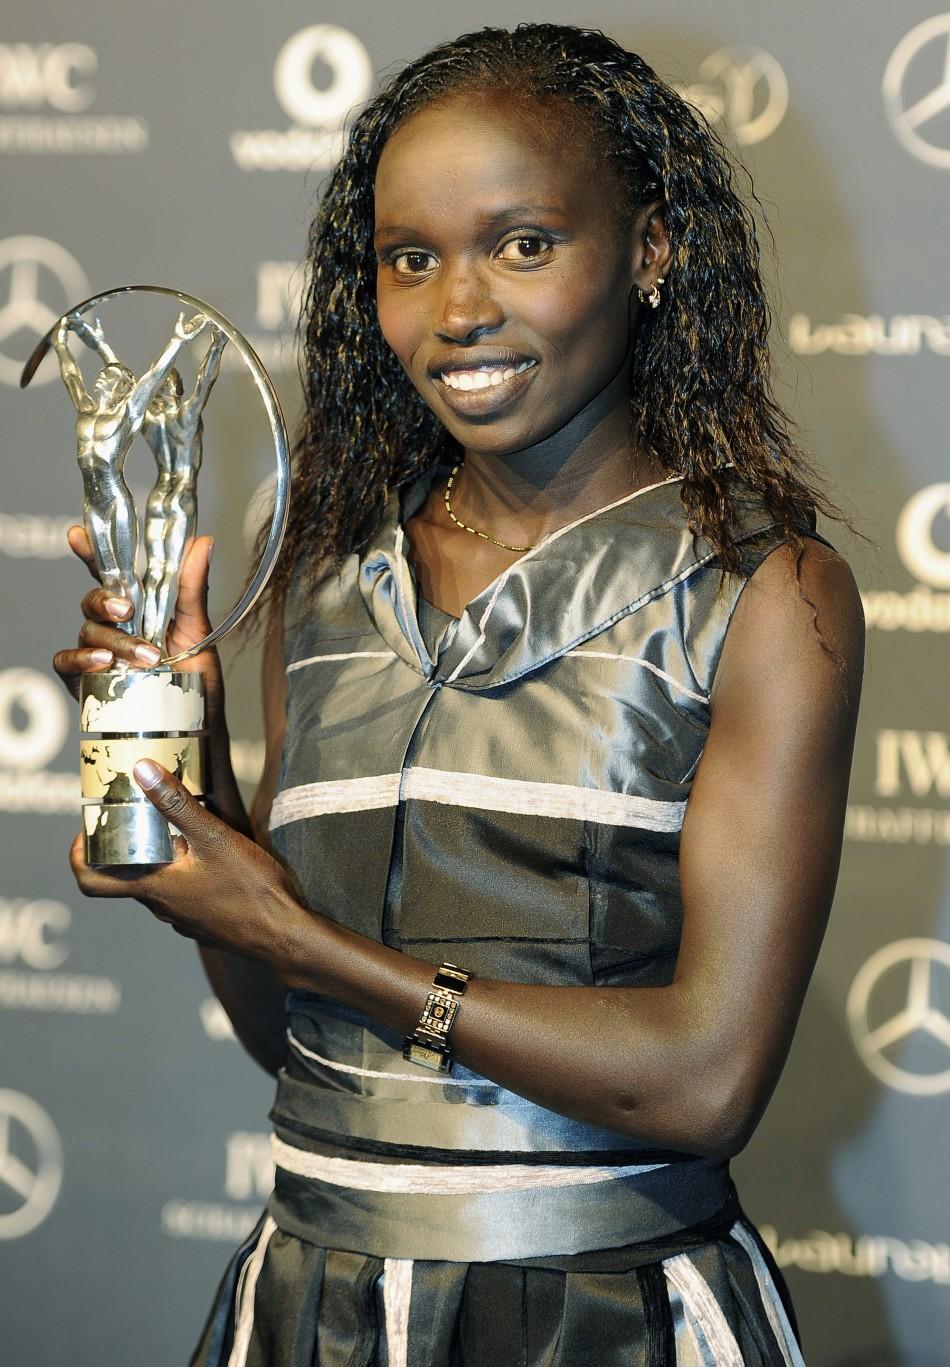 Laureus Sportswoman of the Year